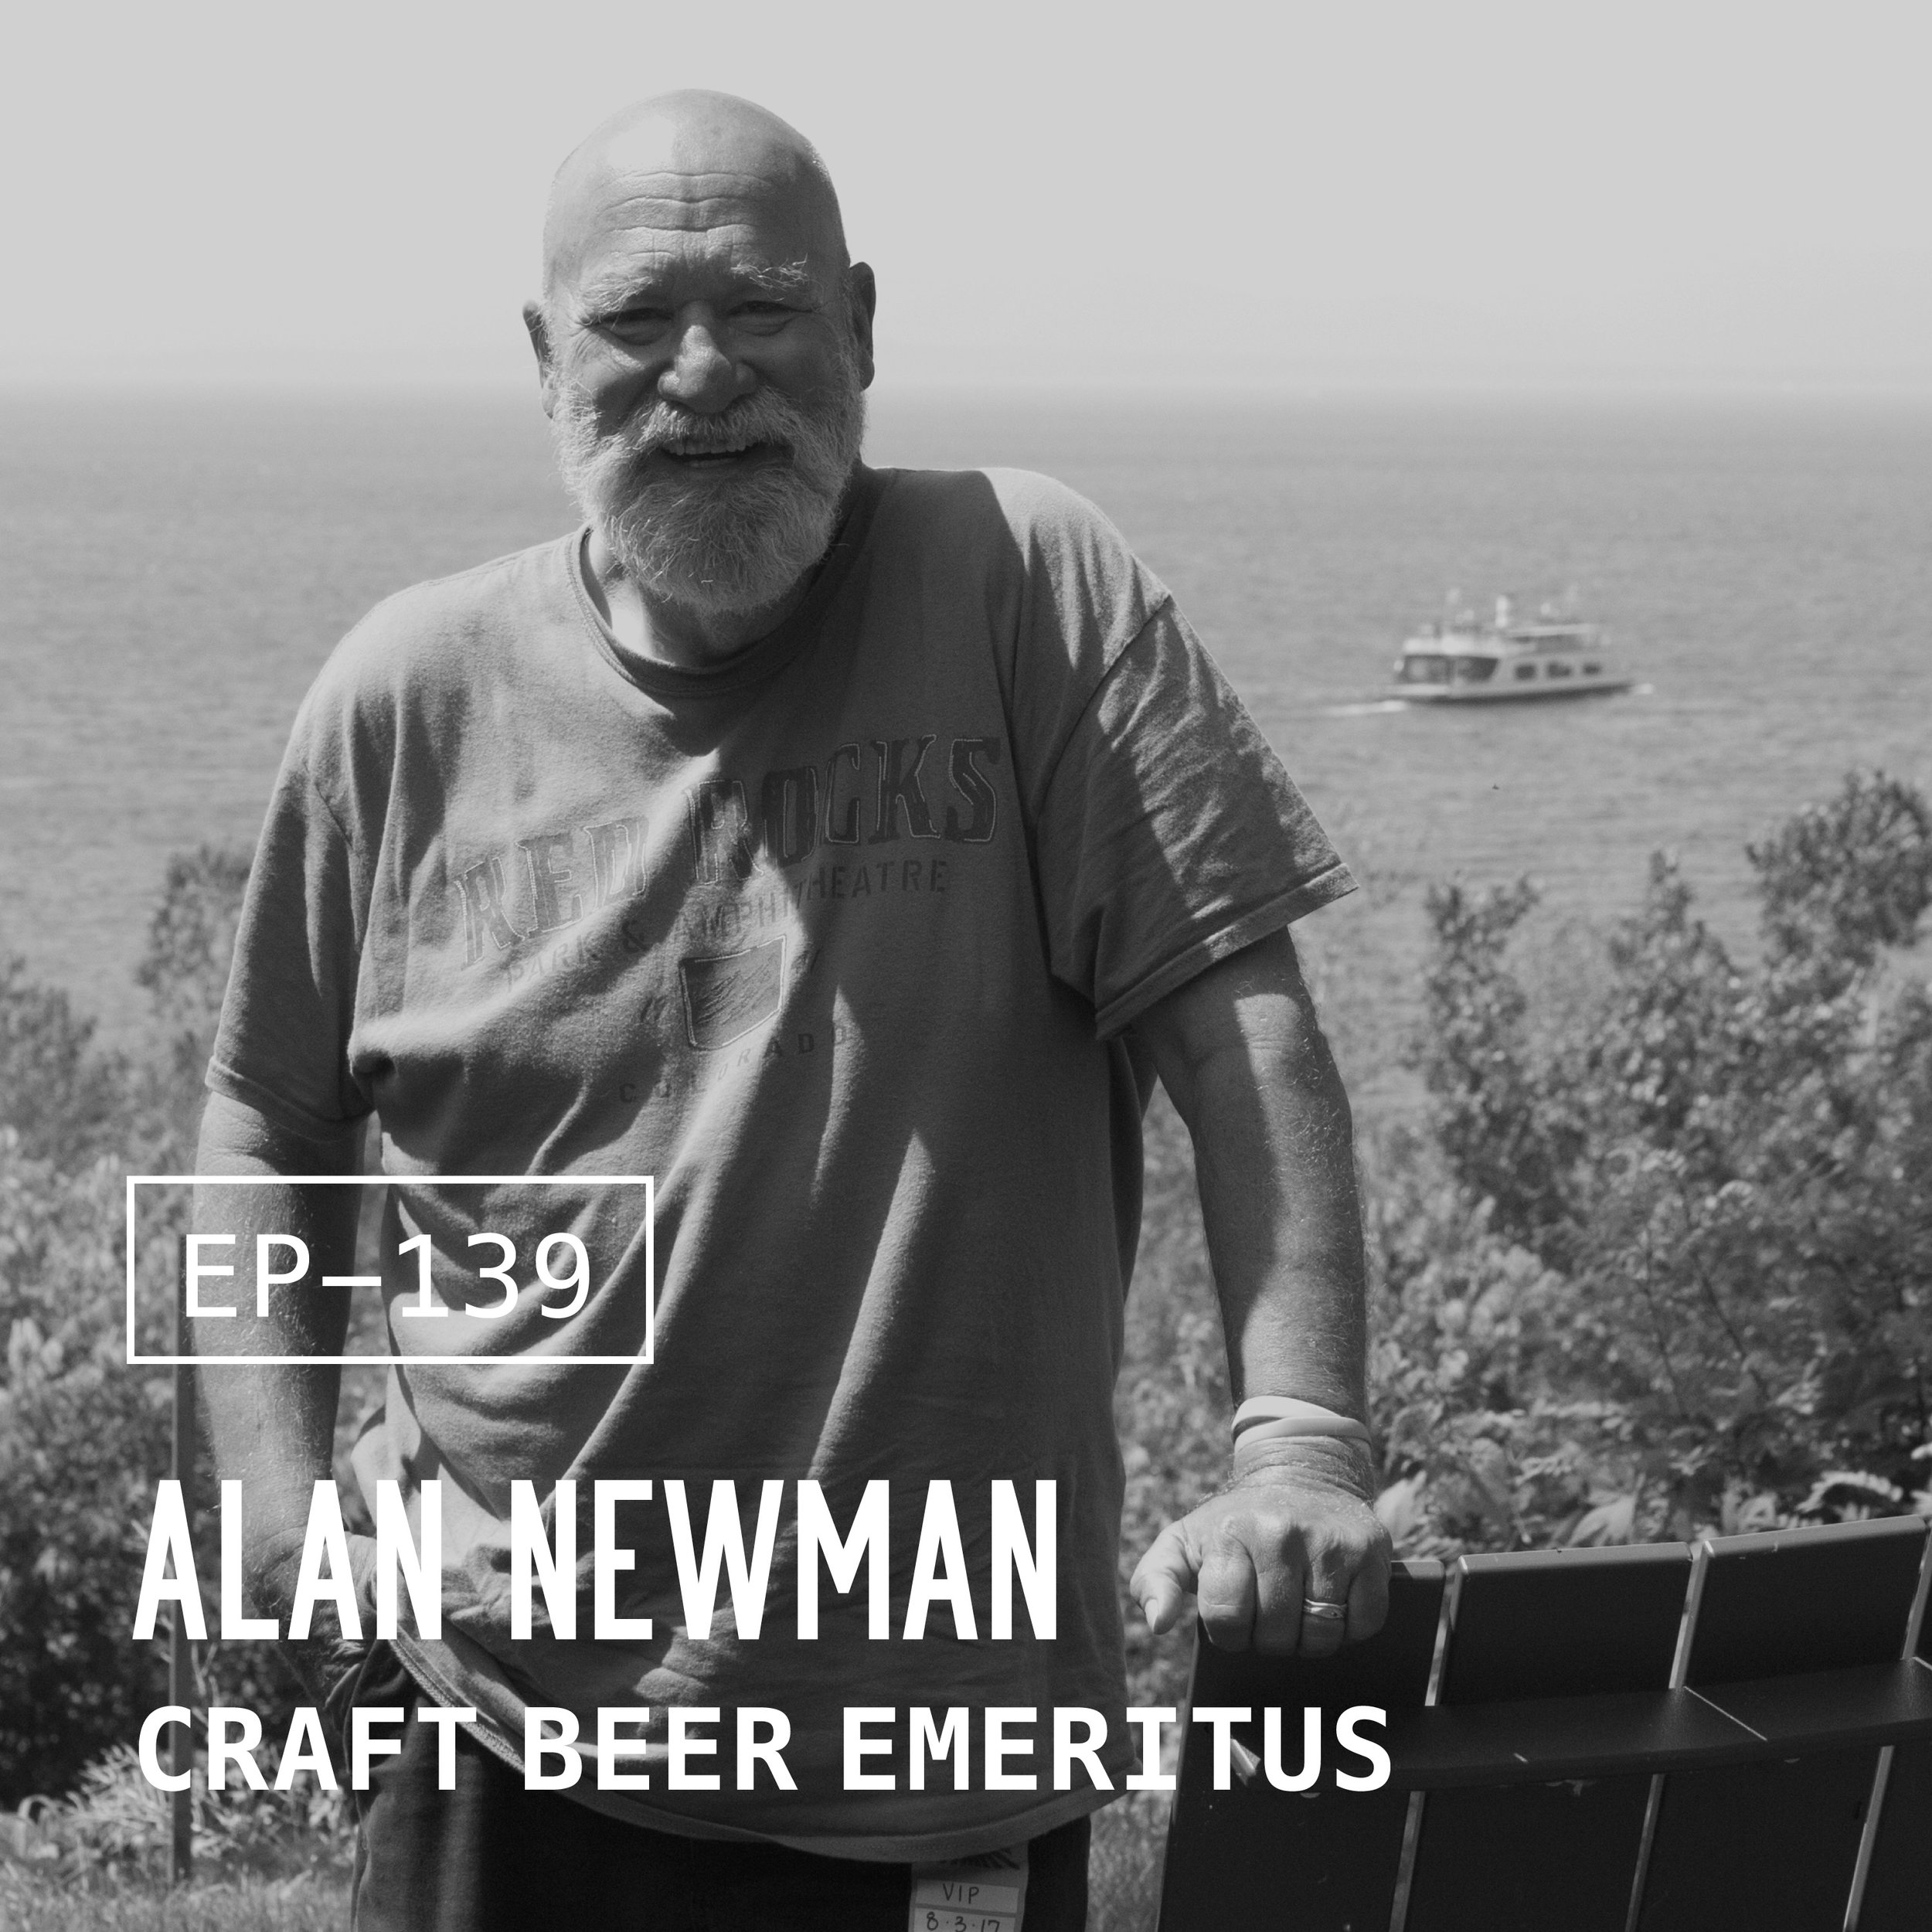 EP 139 Alan Newman, Craft Beer Emeritus